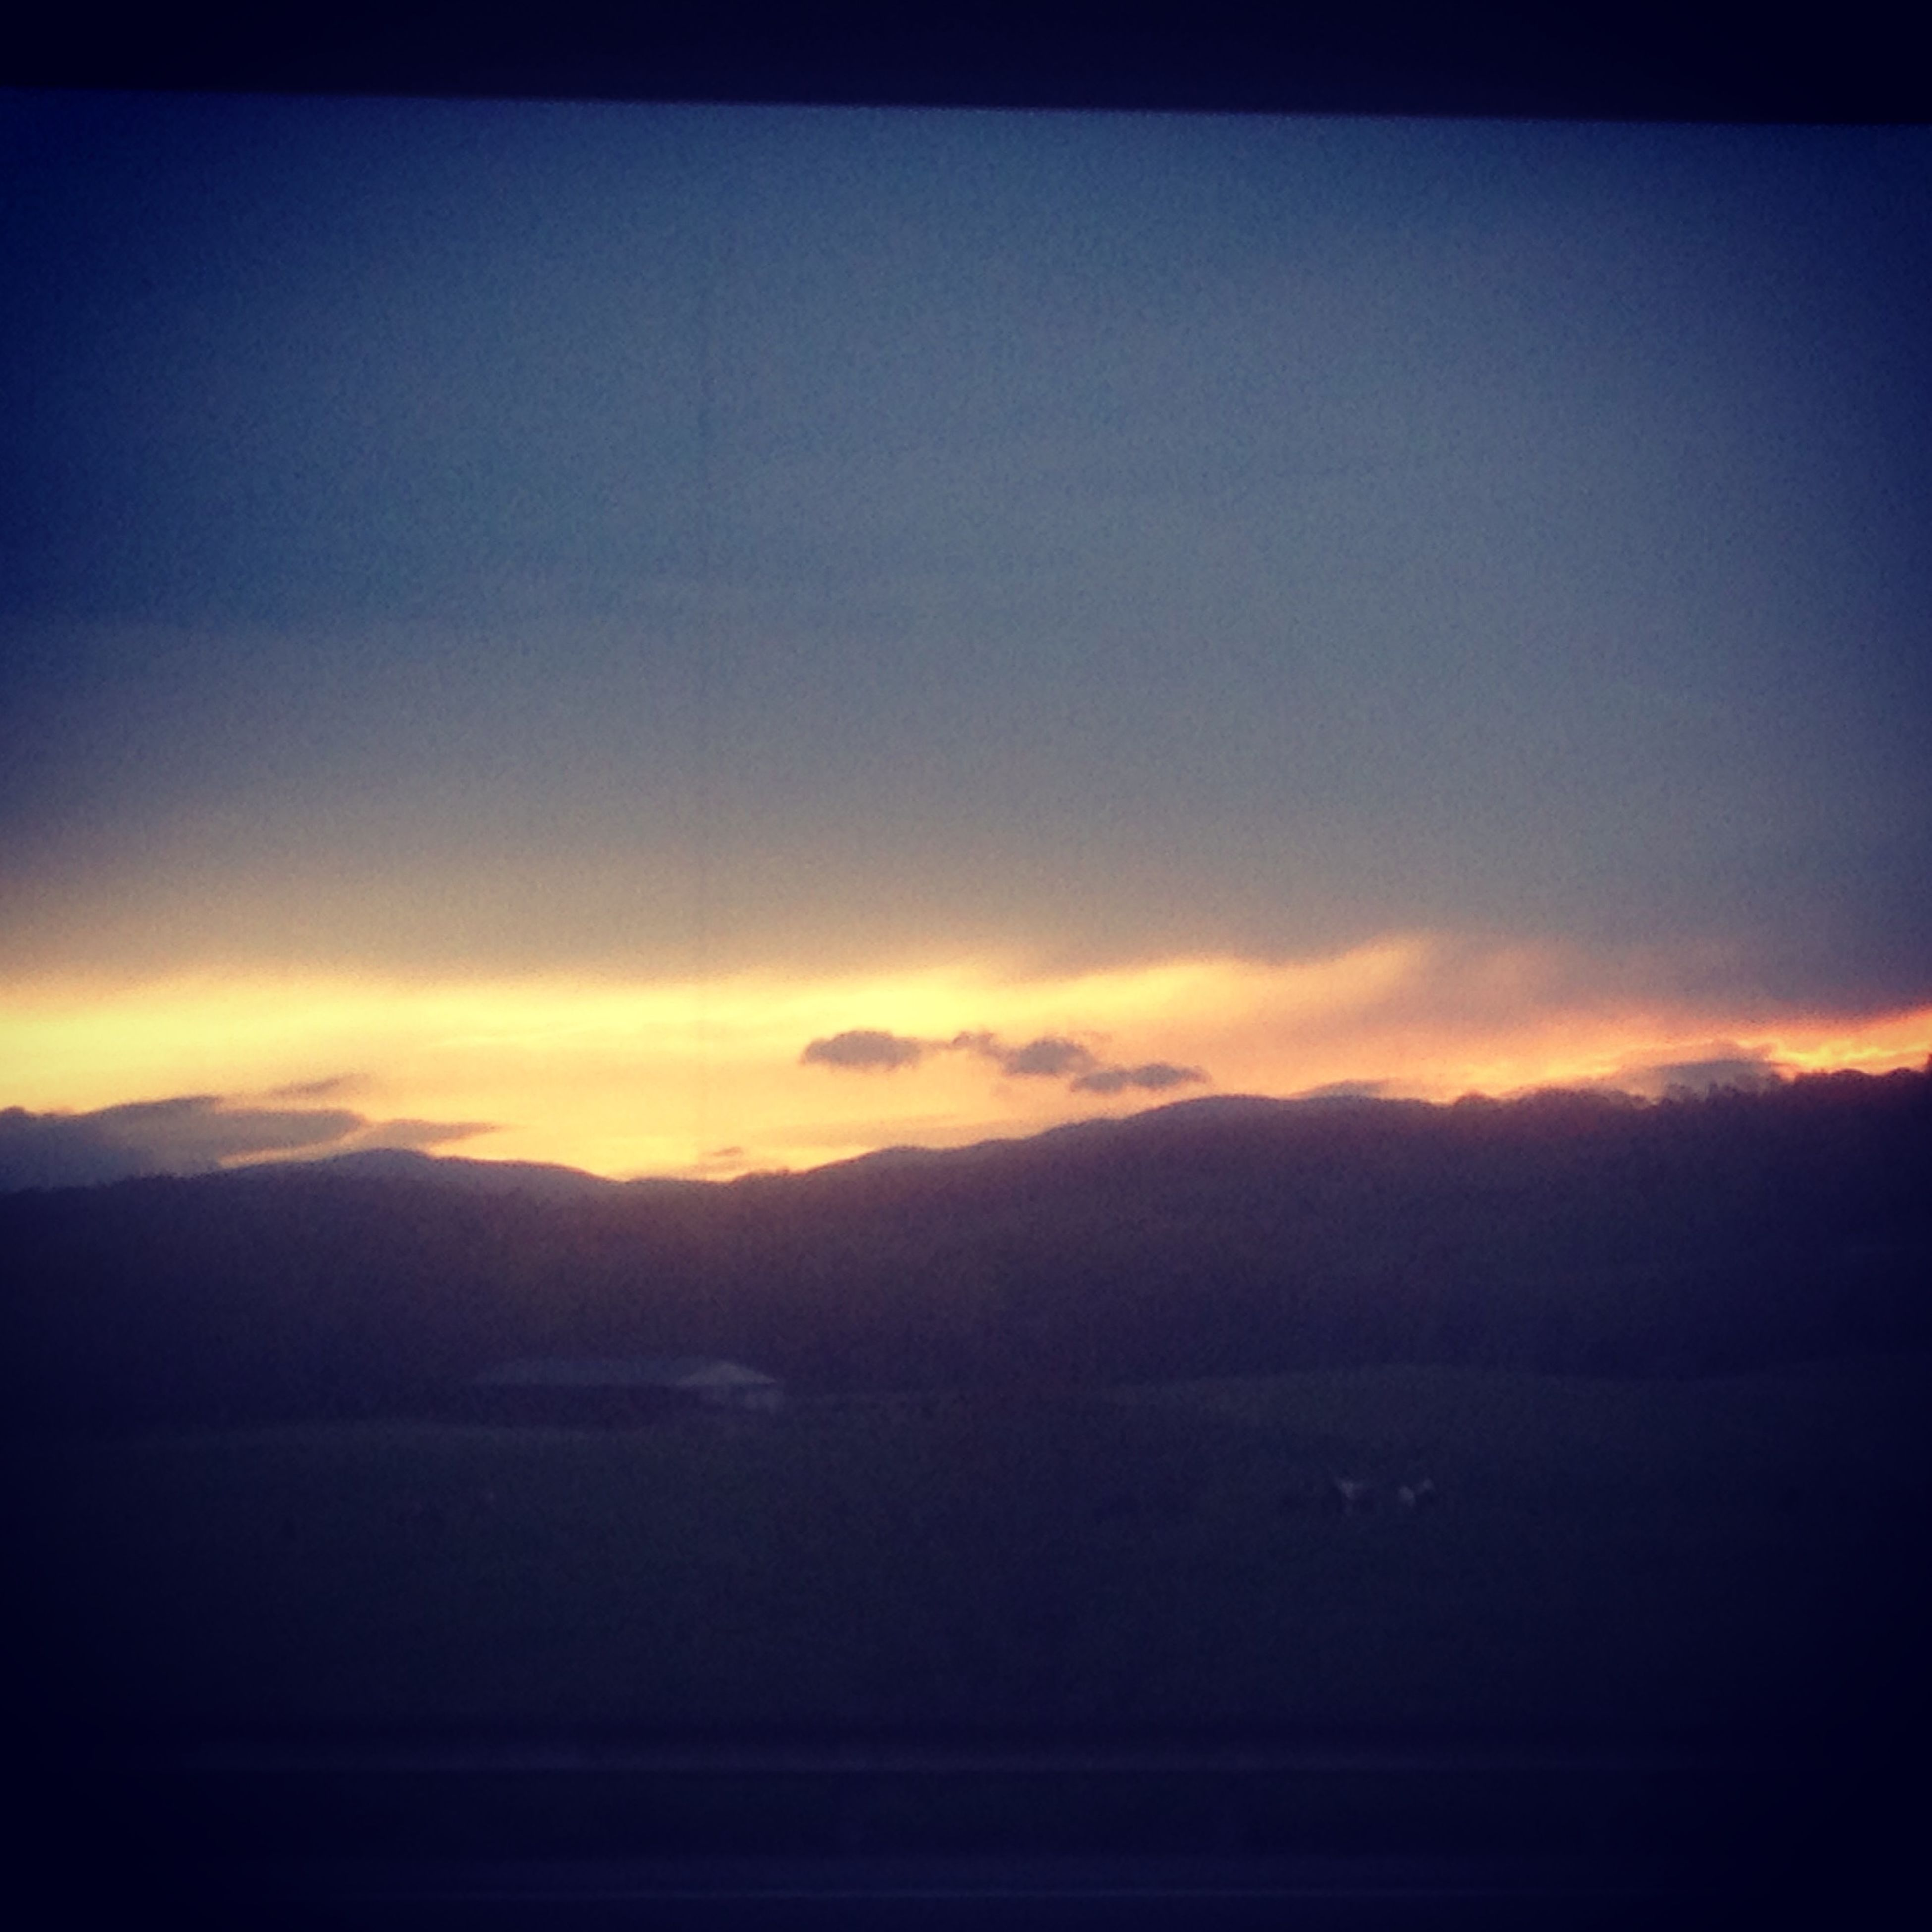 sunset, scenics, tranquil scene, sky, tranquility, beauty in nature, silhouette, orange color, nature, landscape, idyllic, copy space, cloud - sky, dusk, mountain, dark, cloud, outdoors, dramatic sky, no people